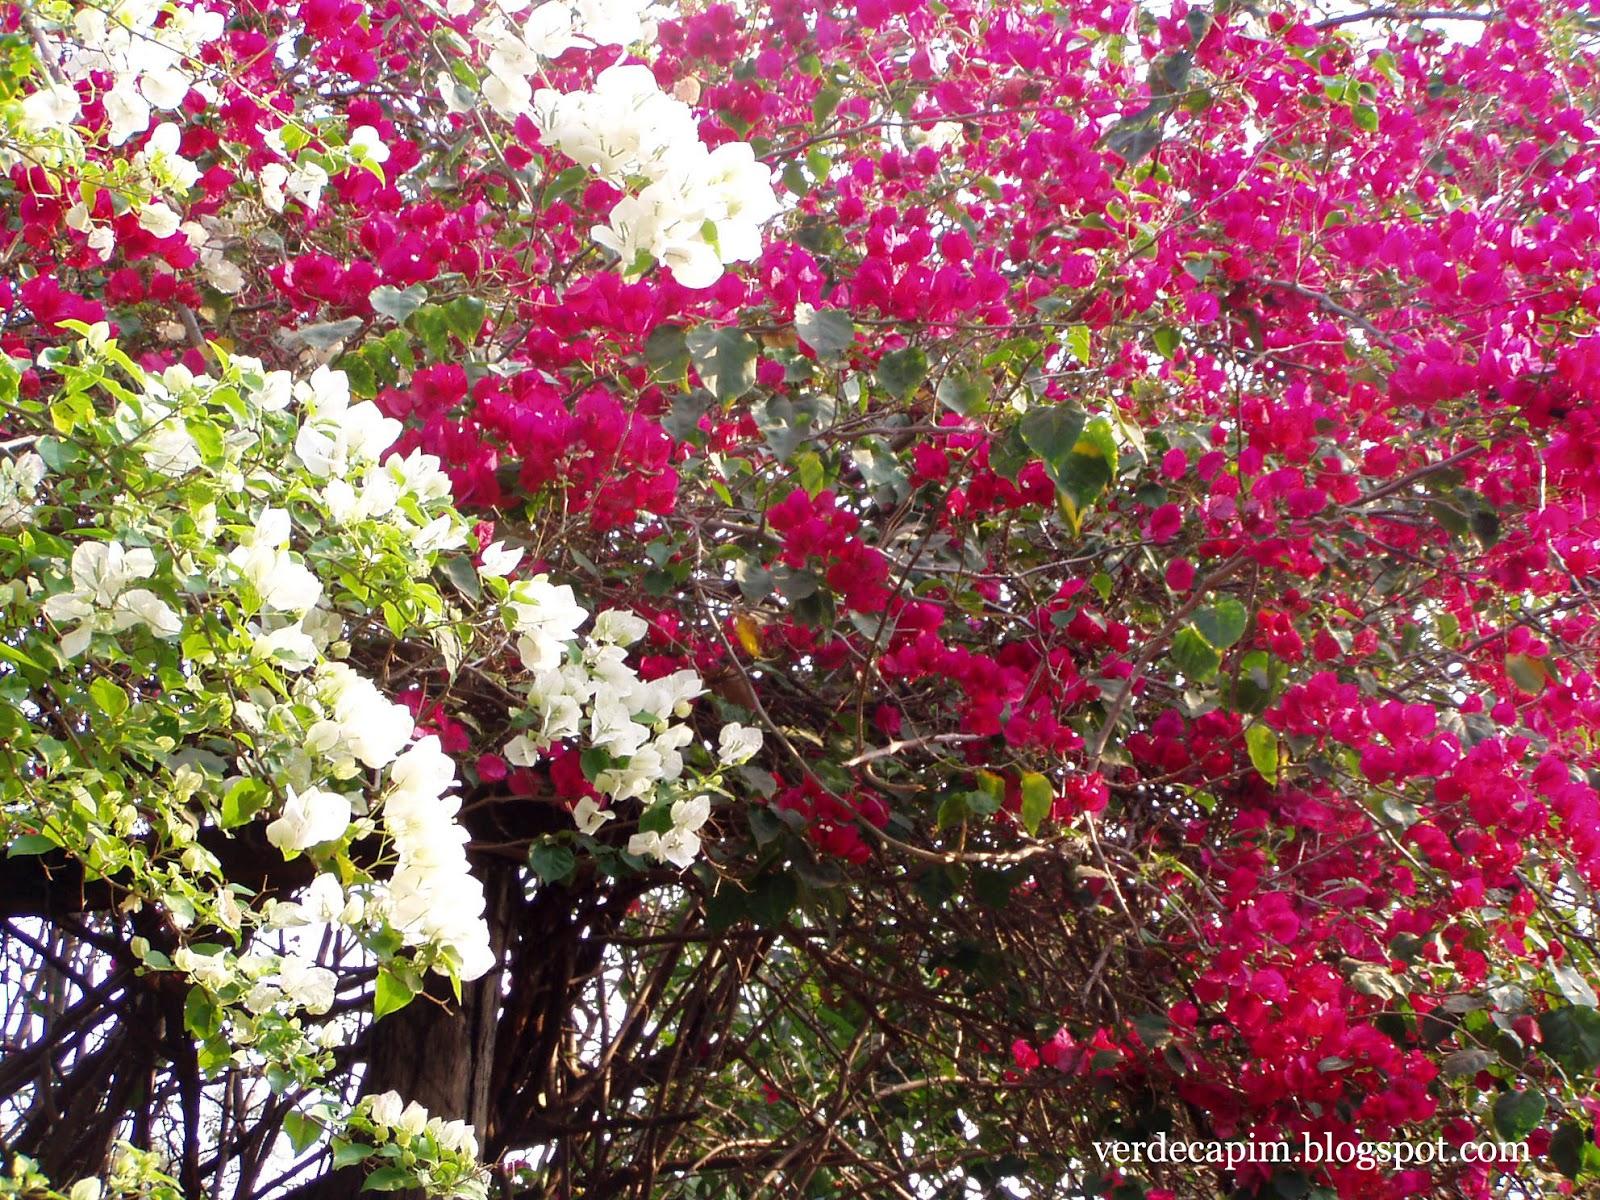 Verde capim si ricomincia for Bouganville fioritura